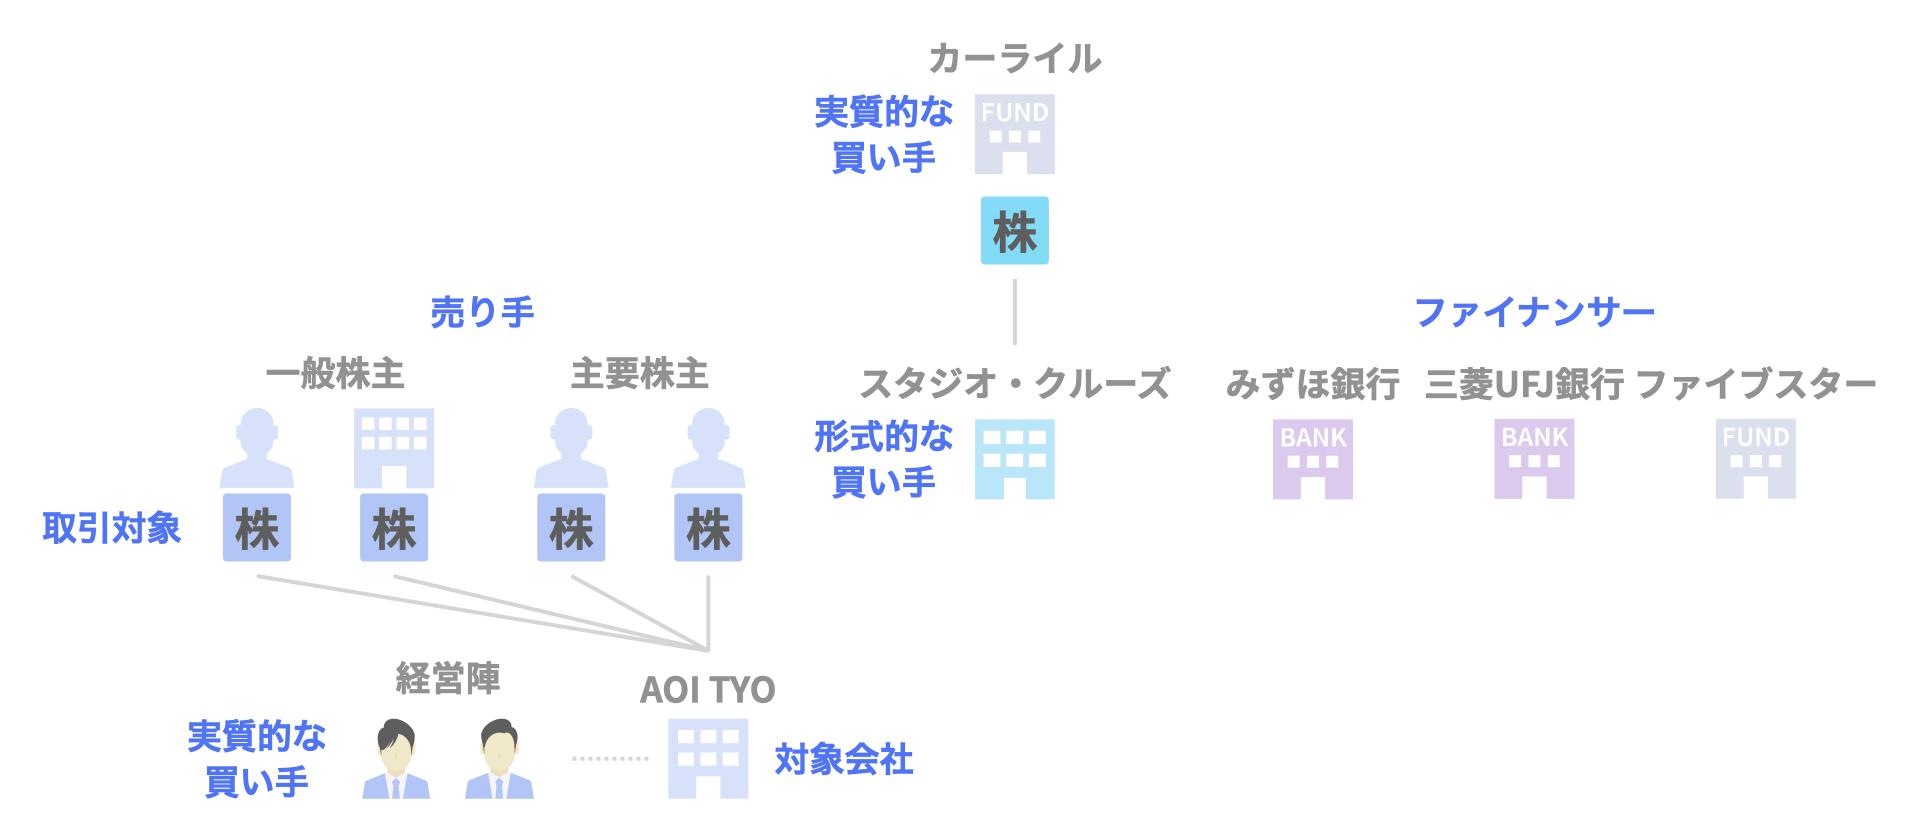 AOI TYOのファンドMBOによる非公開化(カーライル)の関係者